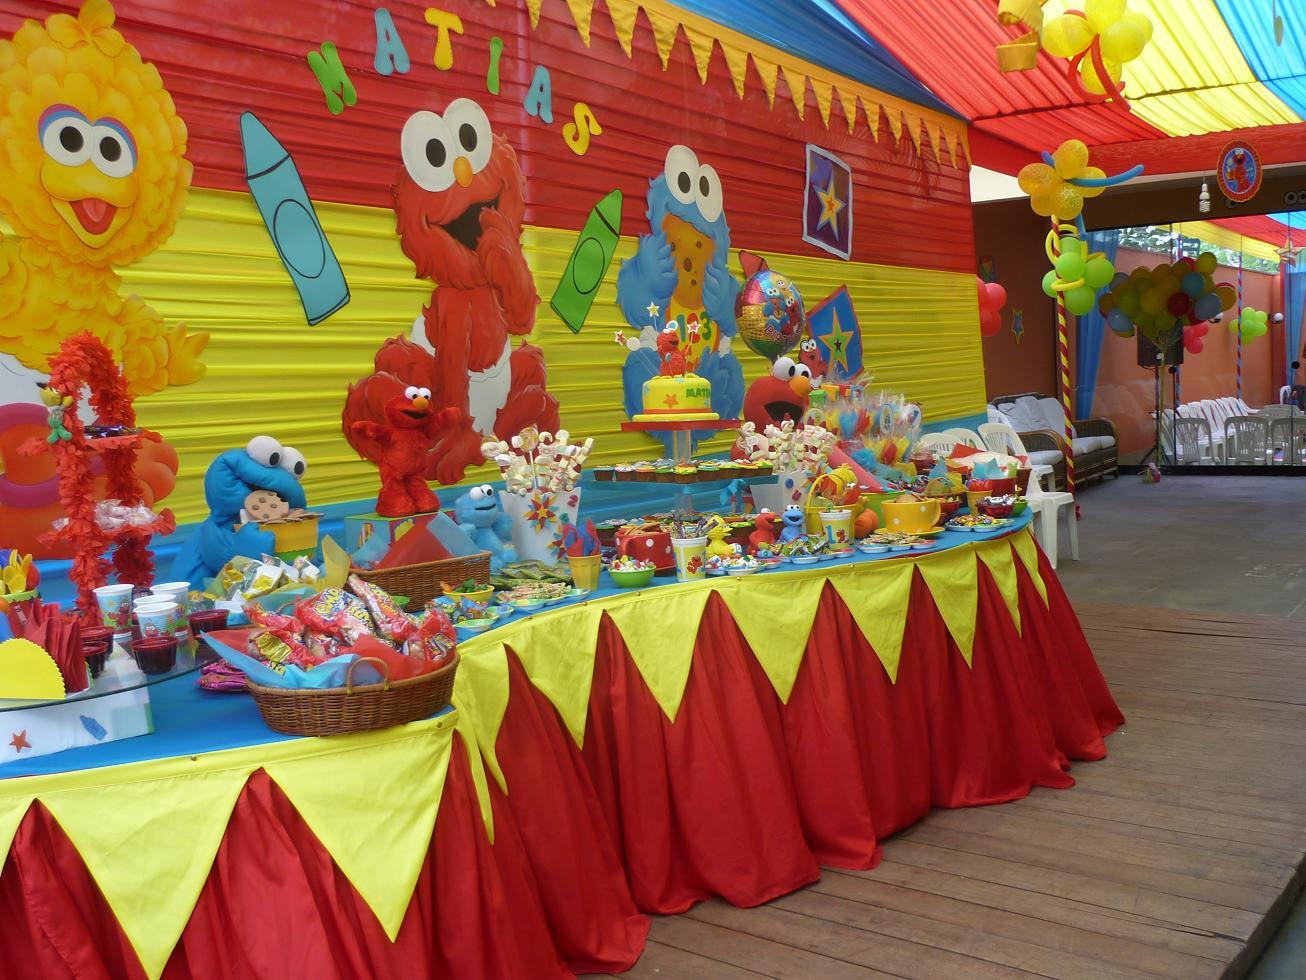 Warma sunqu abril 2010 - Ideas fiestas tematicas ...